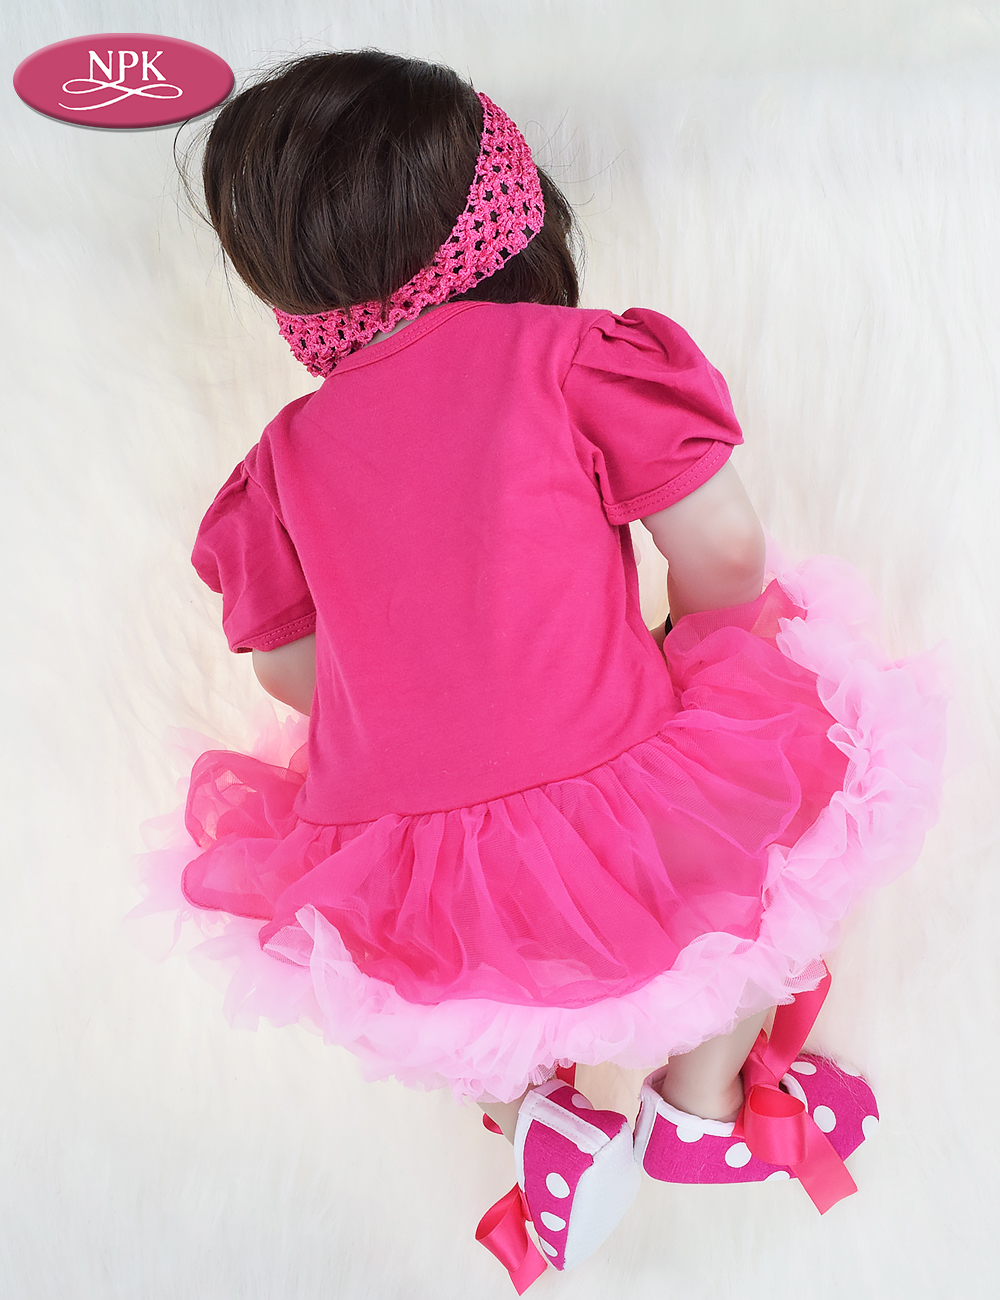 NPK 57CM Full Body Soft Silicone Girls Reborn Baby Doll Bathe Toys Lifelike Princess Girl Dolls Bebe Real Reborn Boneca Menina  (9)